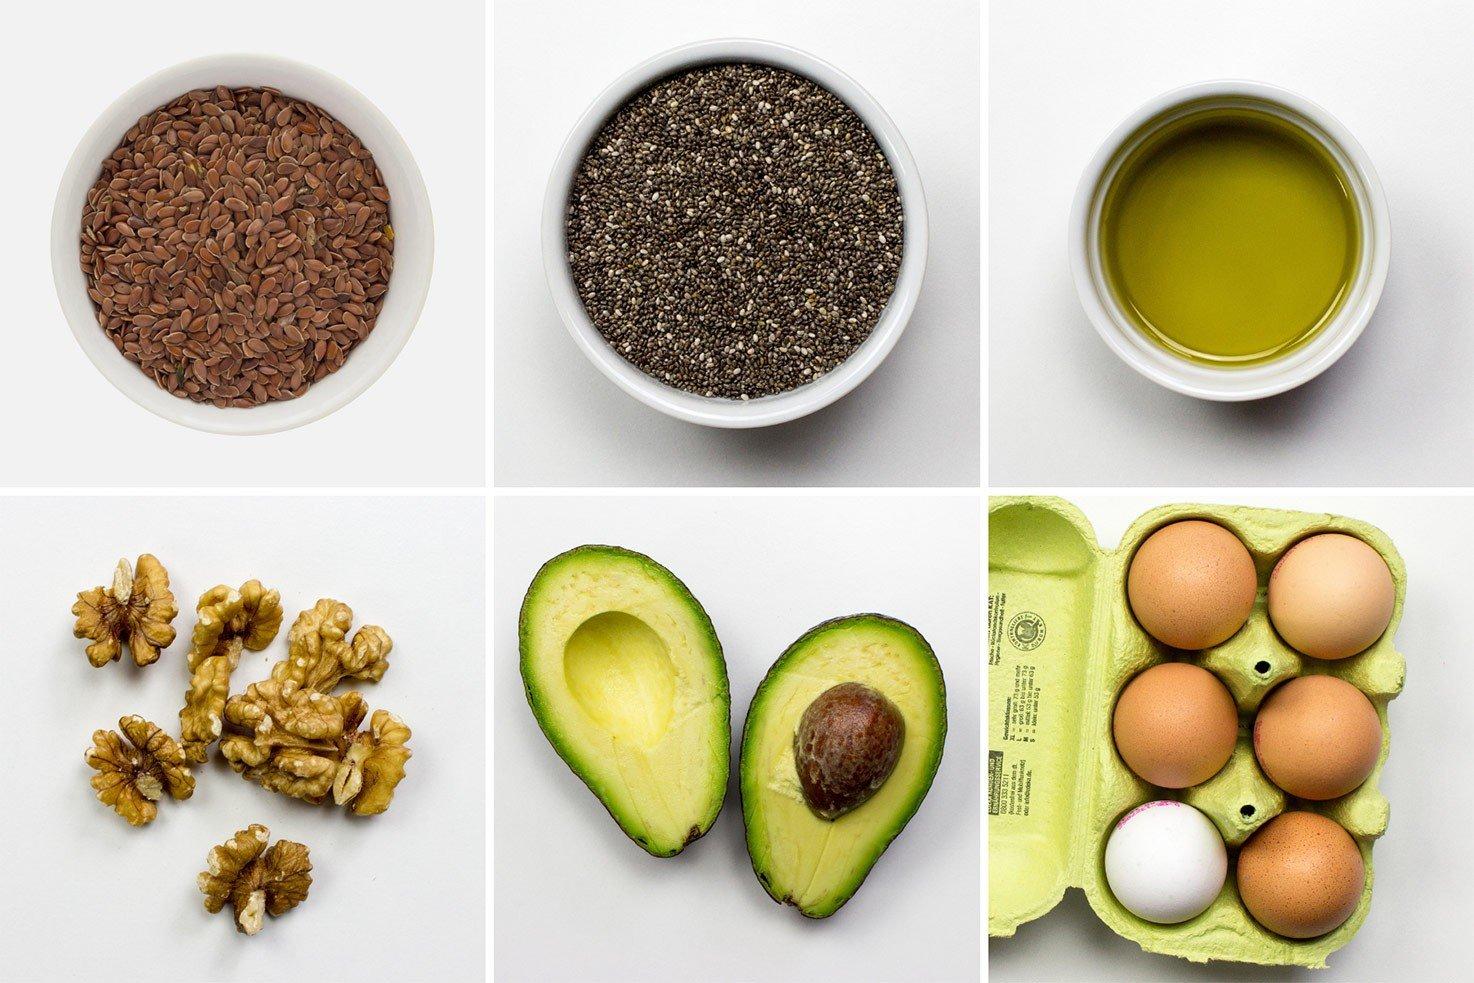 Vegetarian sources of Omega-3: flax seeds, chia seeds, olive oil, walnuts, avocado, eggs | hurrythefoodup.com